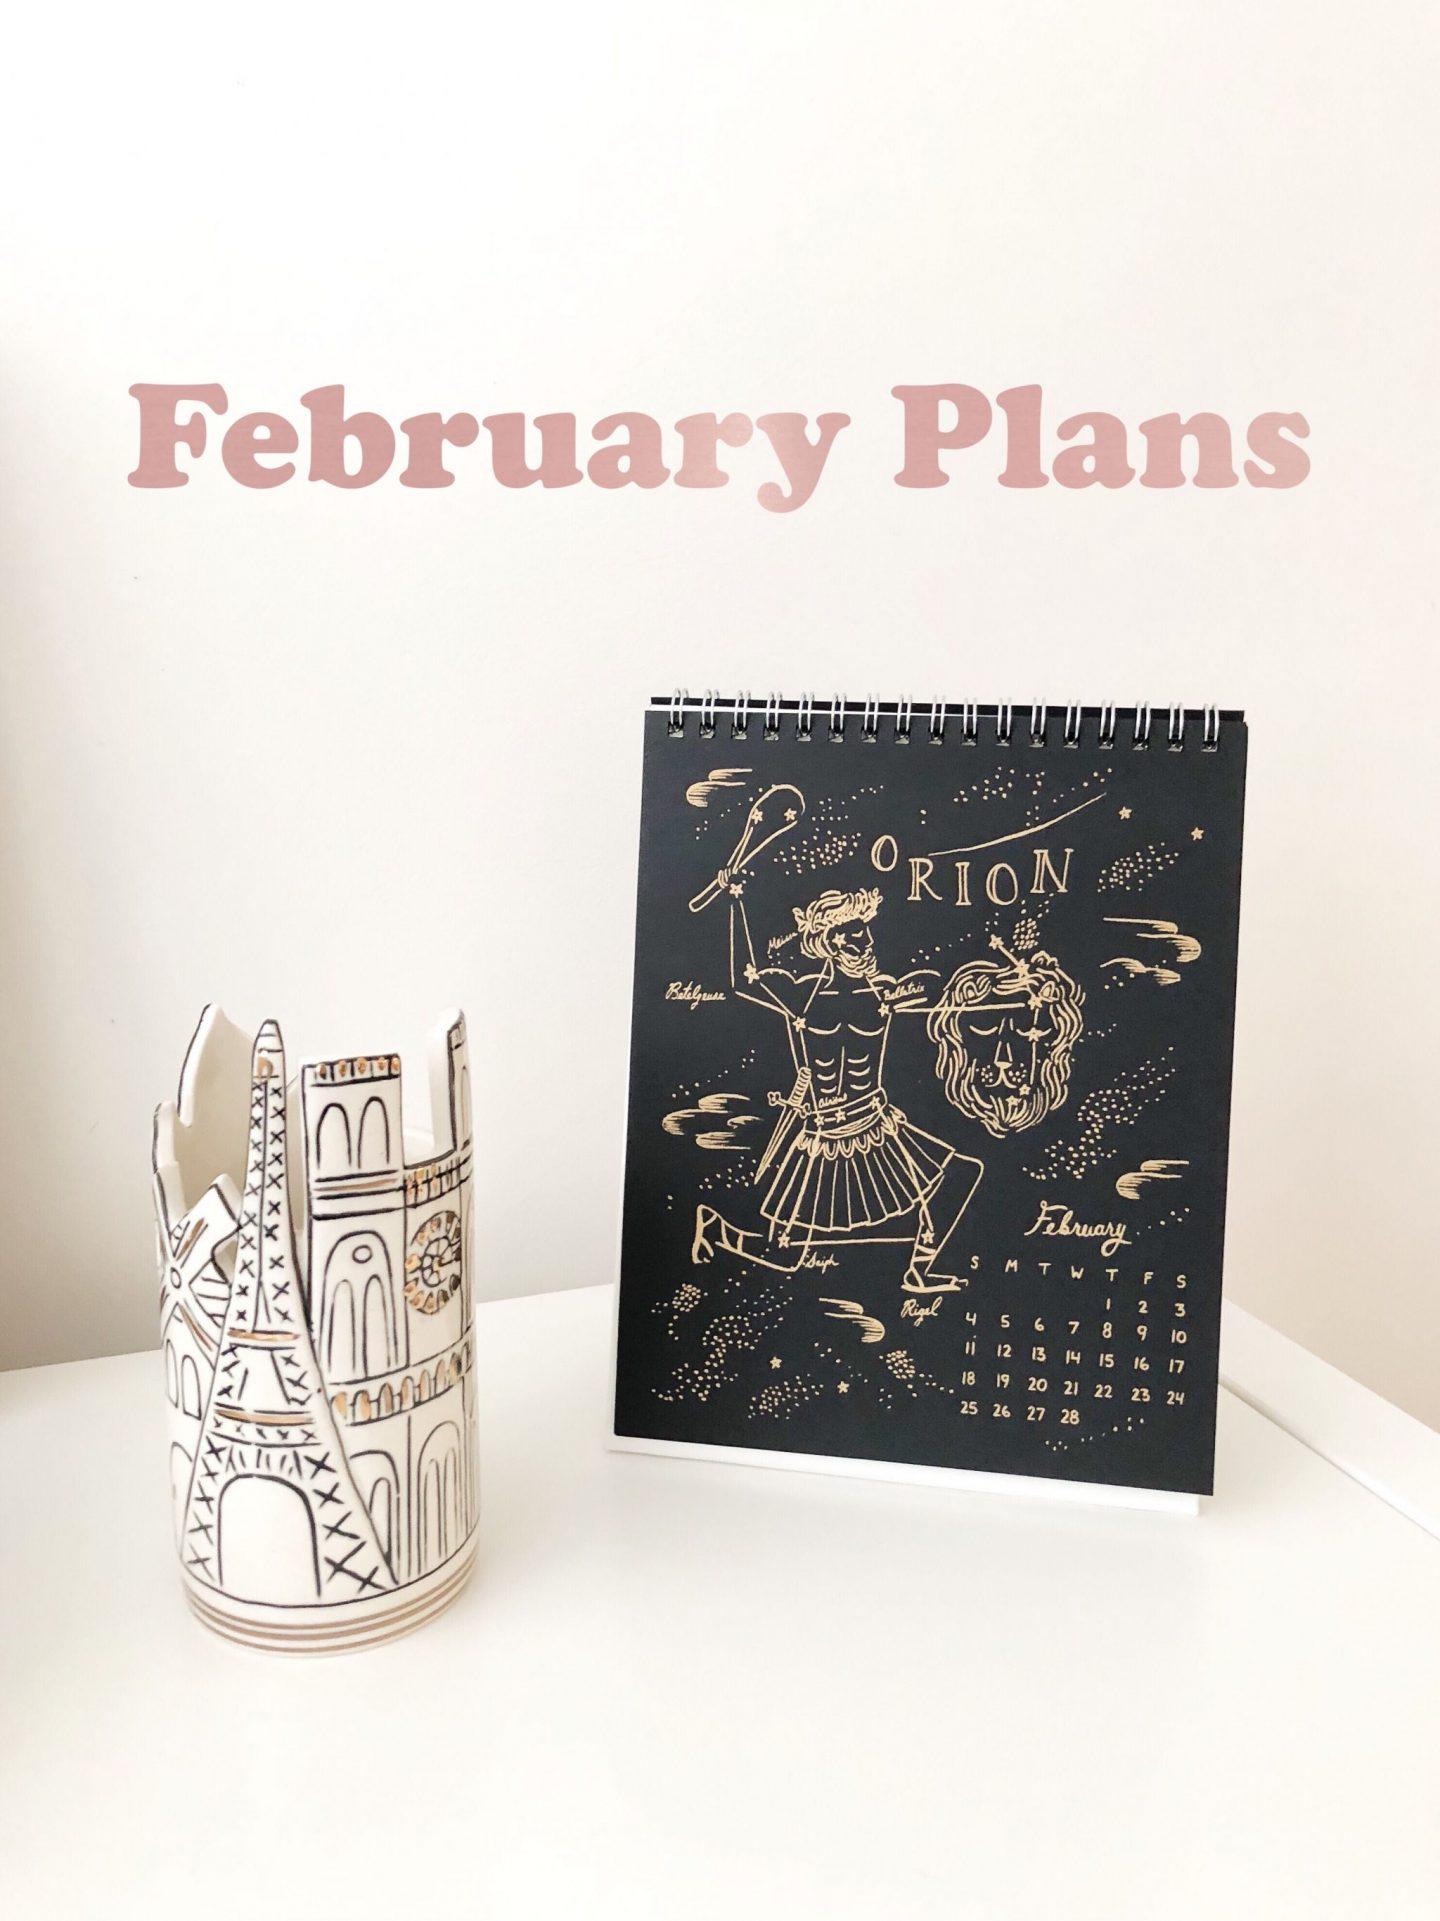 February '18 Plans